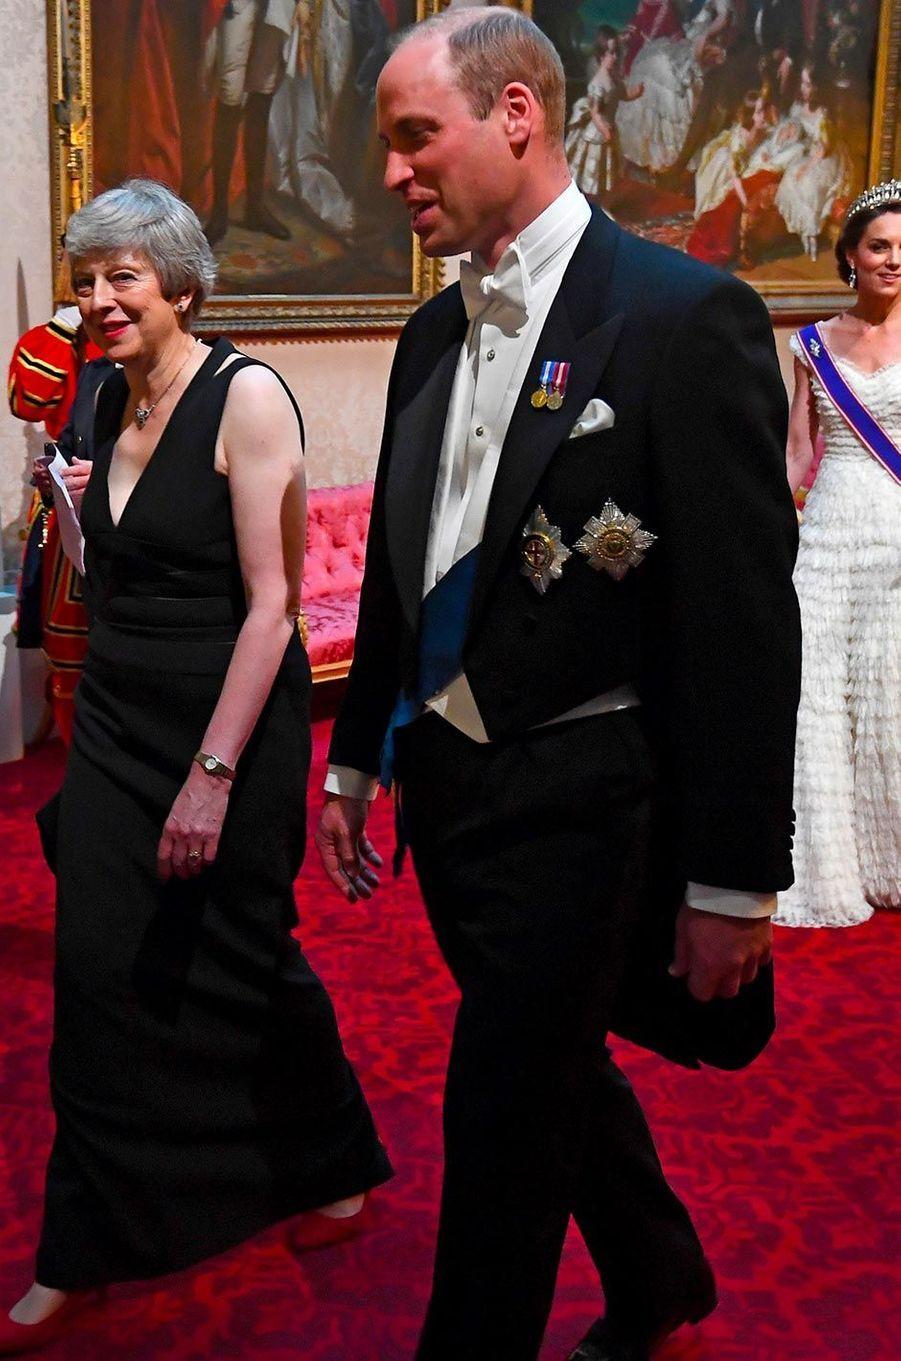 Theresa May et le prince William àBuckingham Palace, le 3 juin 2019.